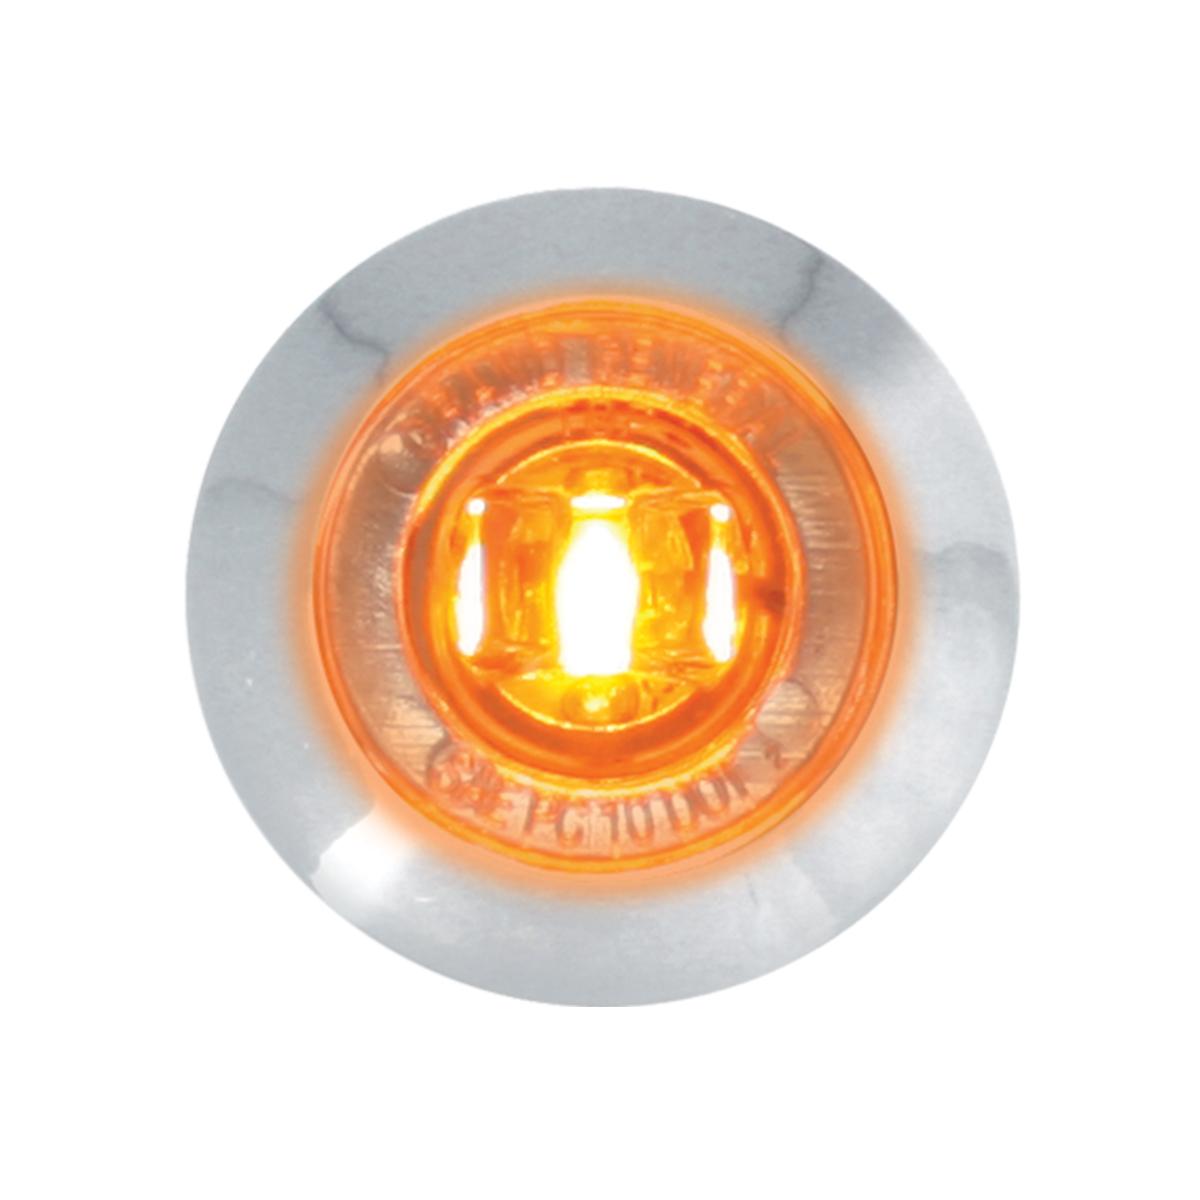 "75271 1"" Dual Function Mini Push/Screw-in Wide Angle LED Light w/ Chrome Bezel"